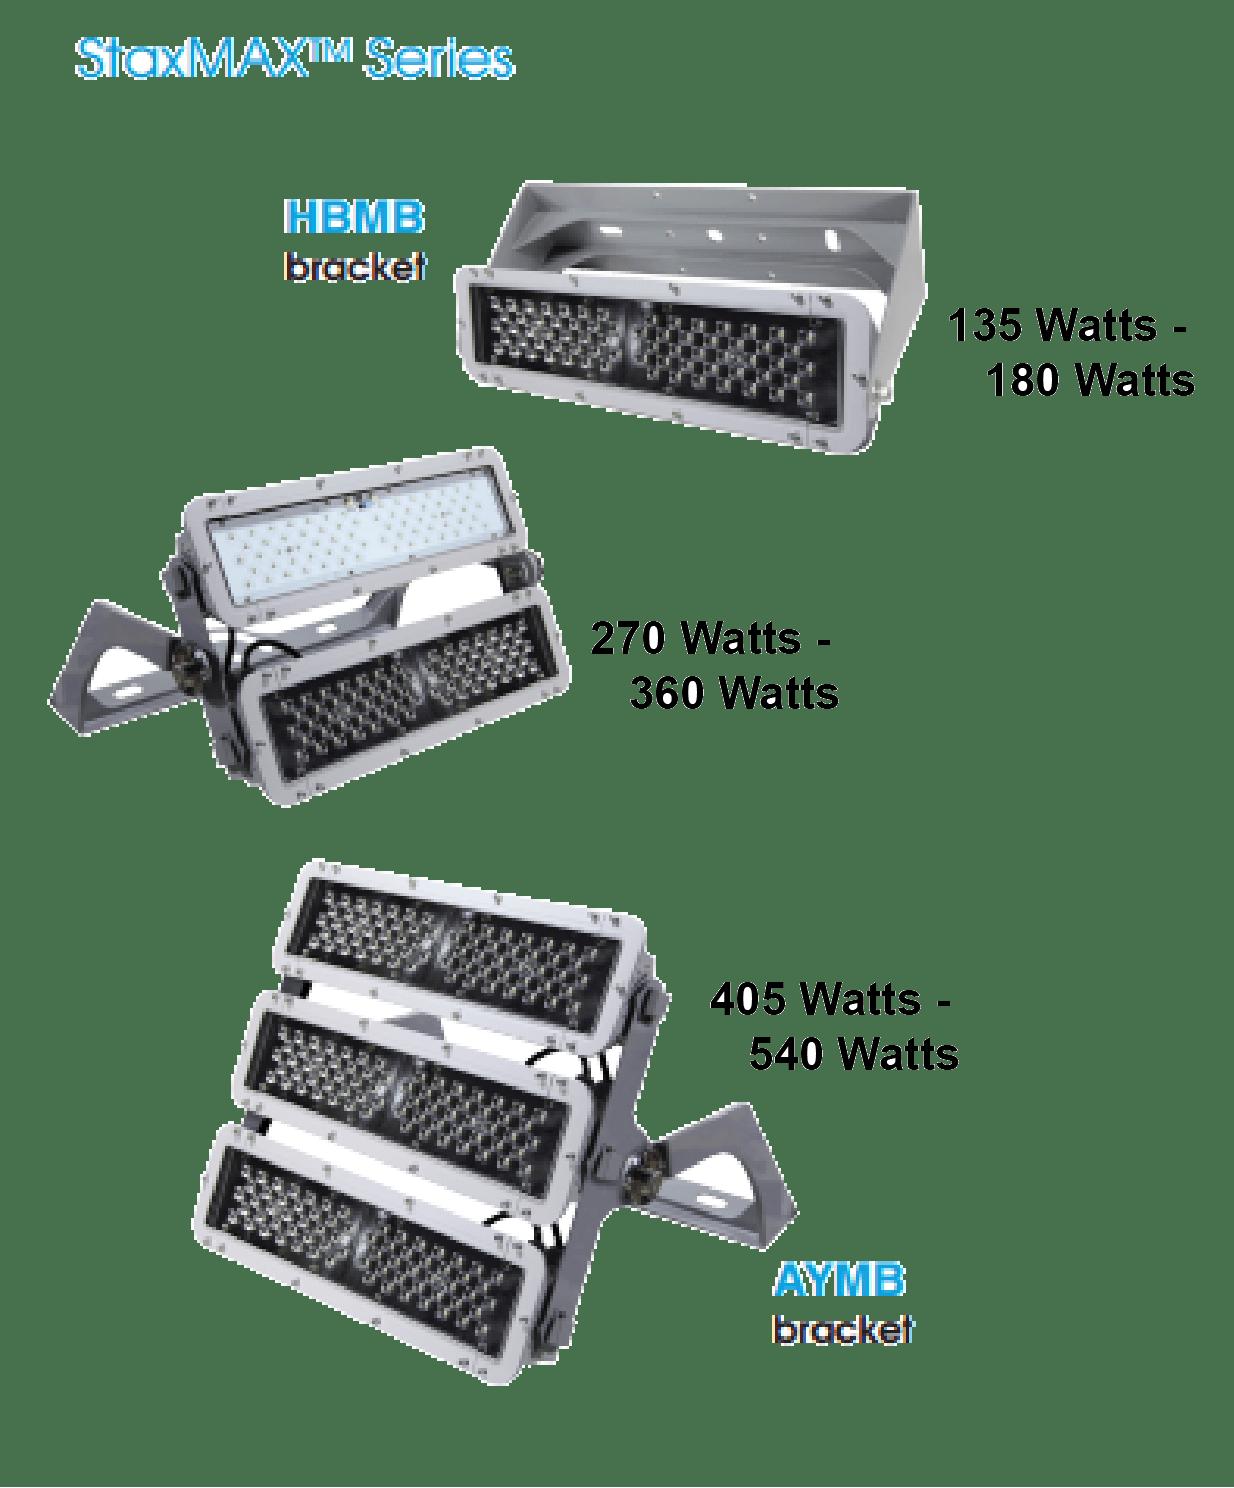 Maxlite Ellf360dn50 Staxmax Series